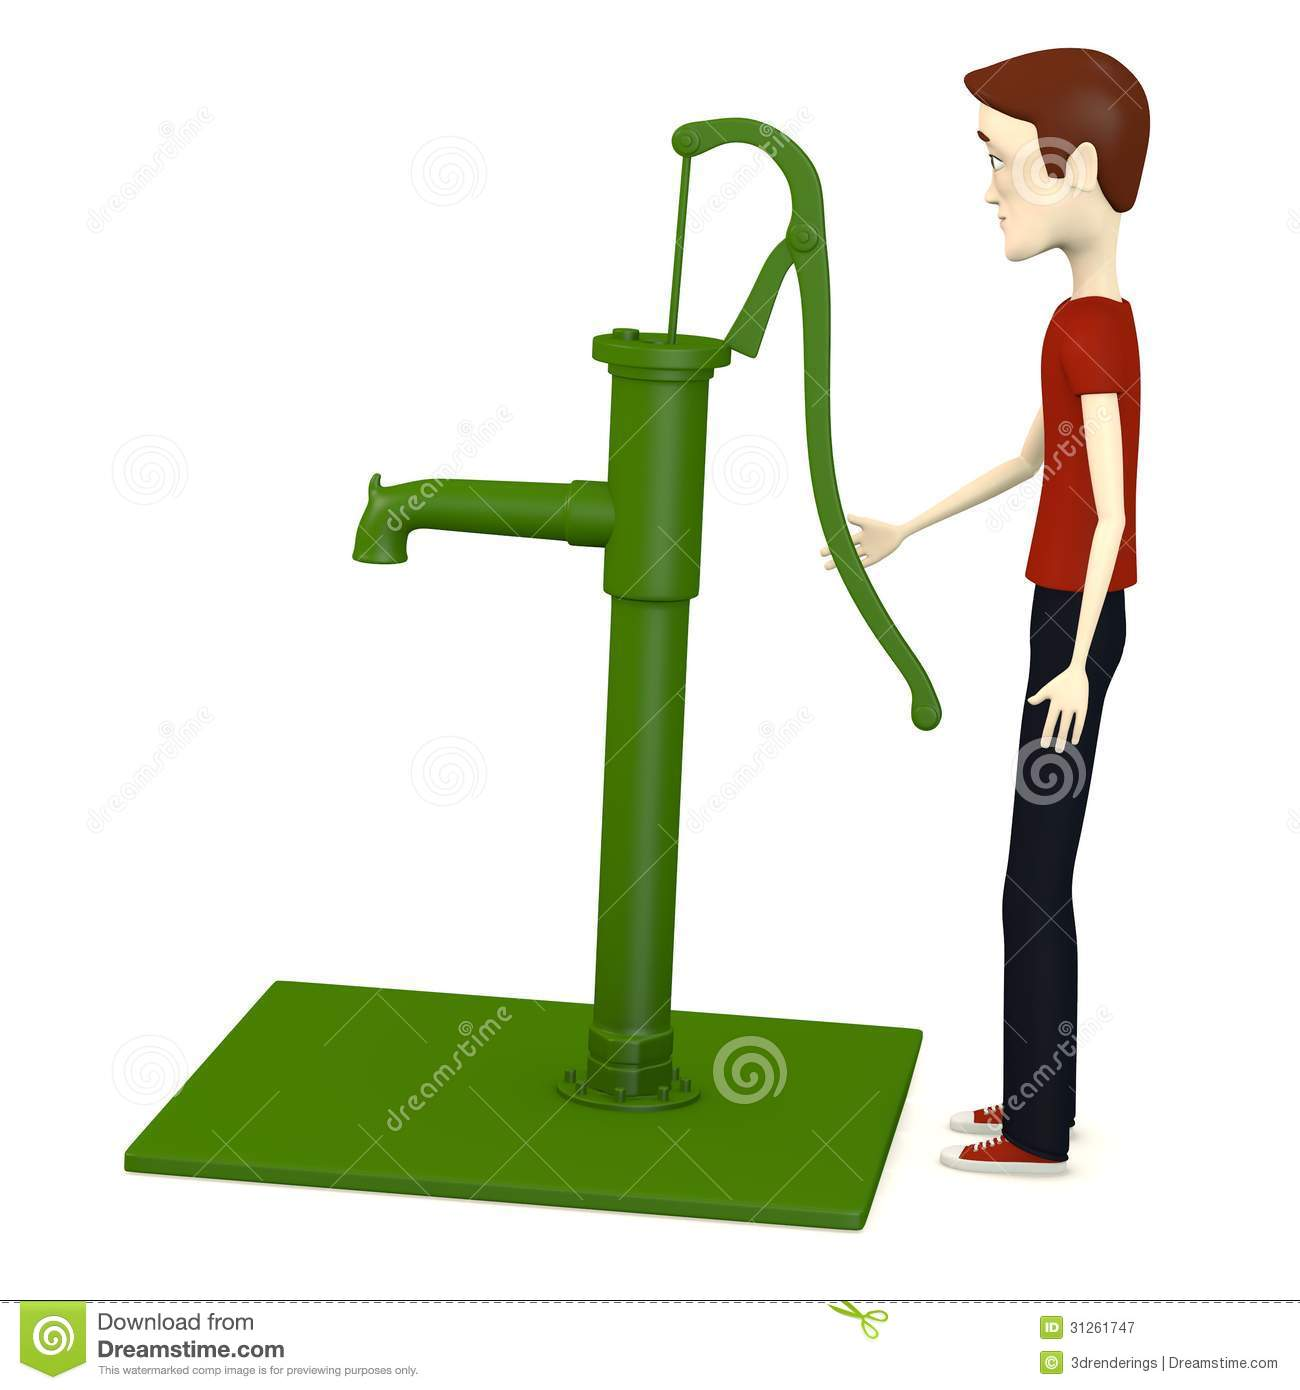 Water well pump clipart.